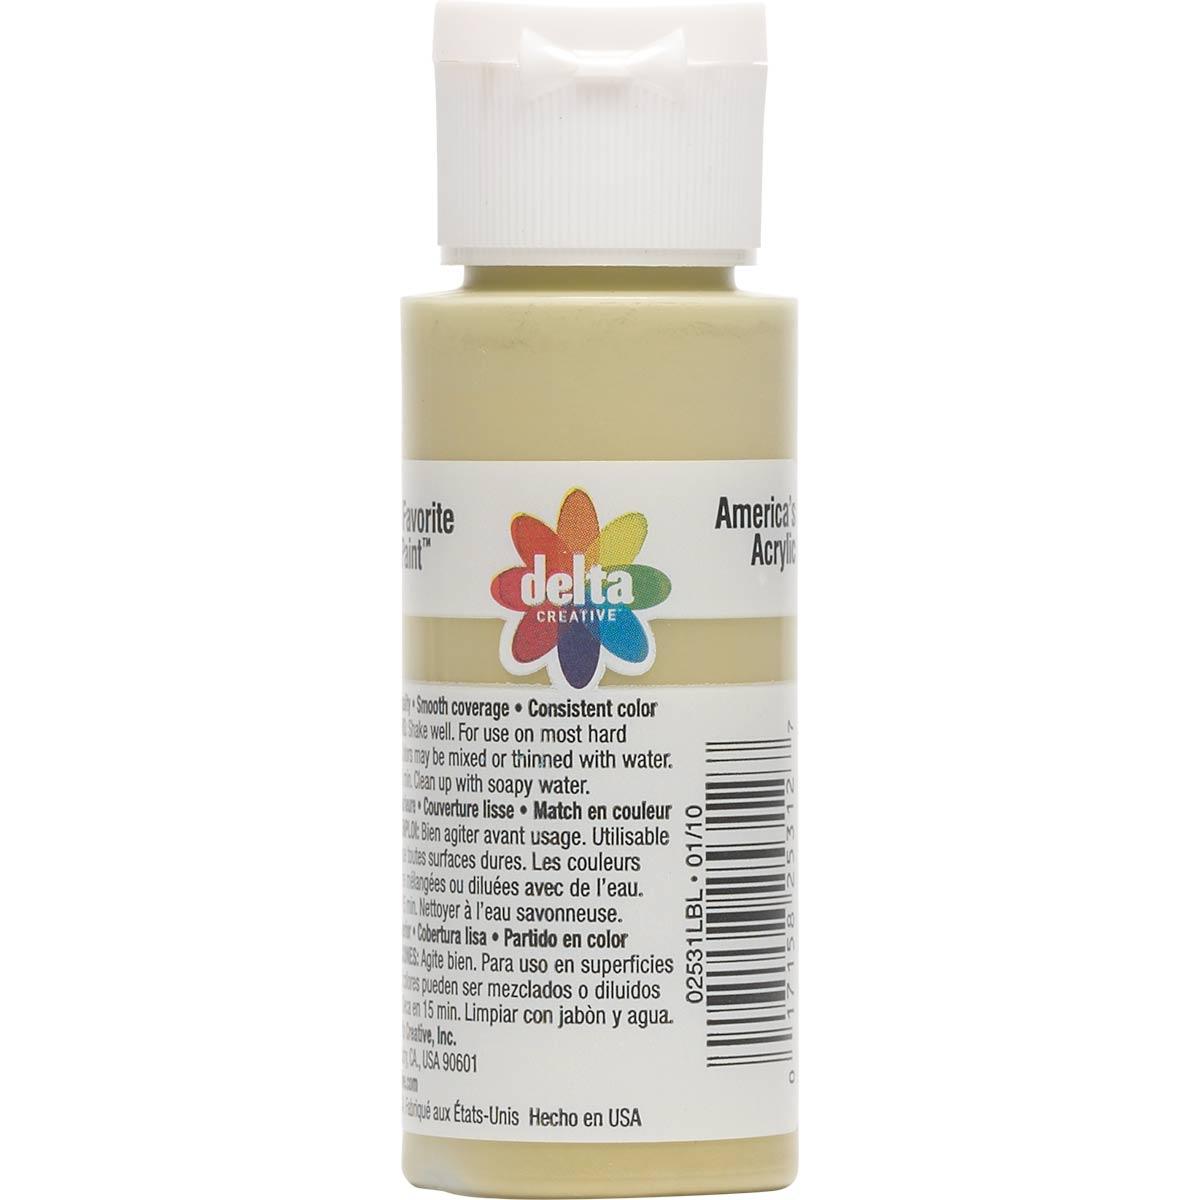 Delta Ceramcoat ® Acrylic Paint - Light Timberline Green, 2 oz. - 025310202W